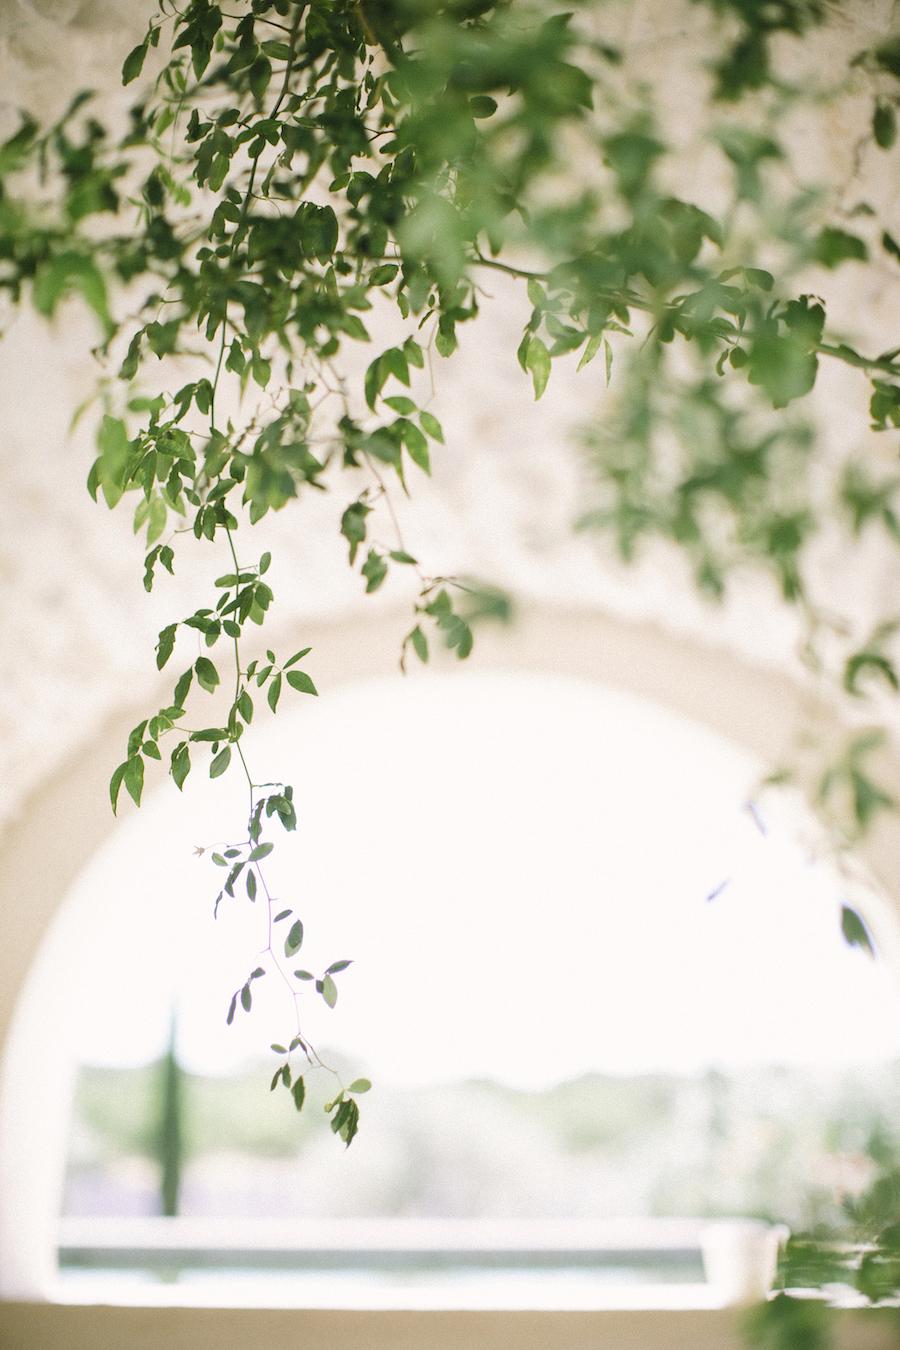 saya-photography-rustic-french-wedding-provence-domaines-de-patras-26.jpg